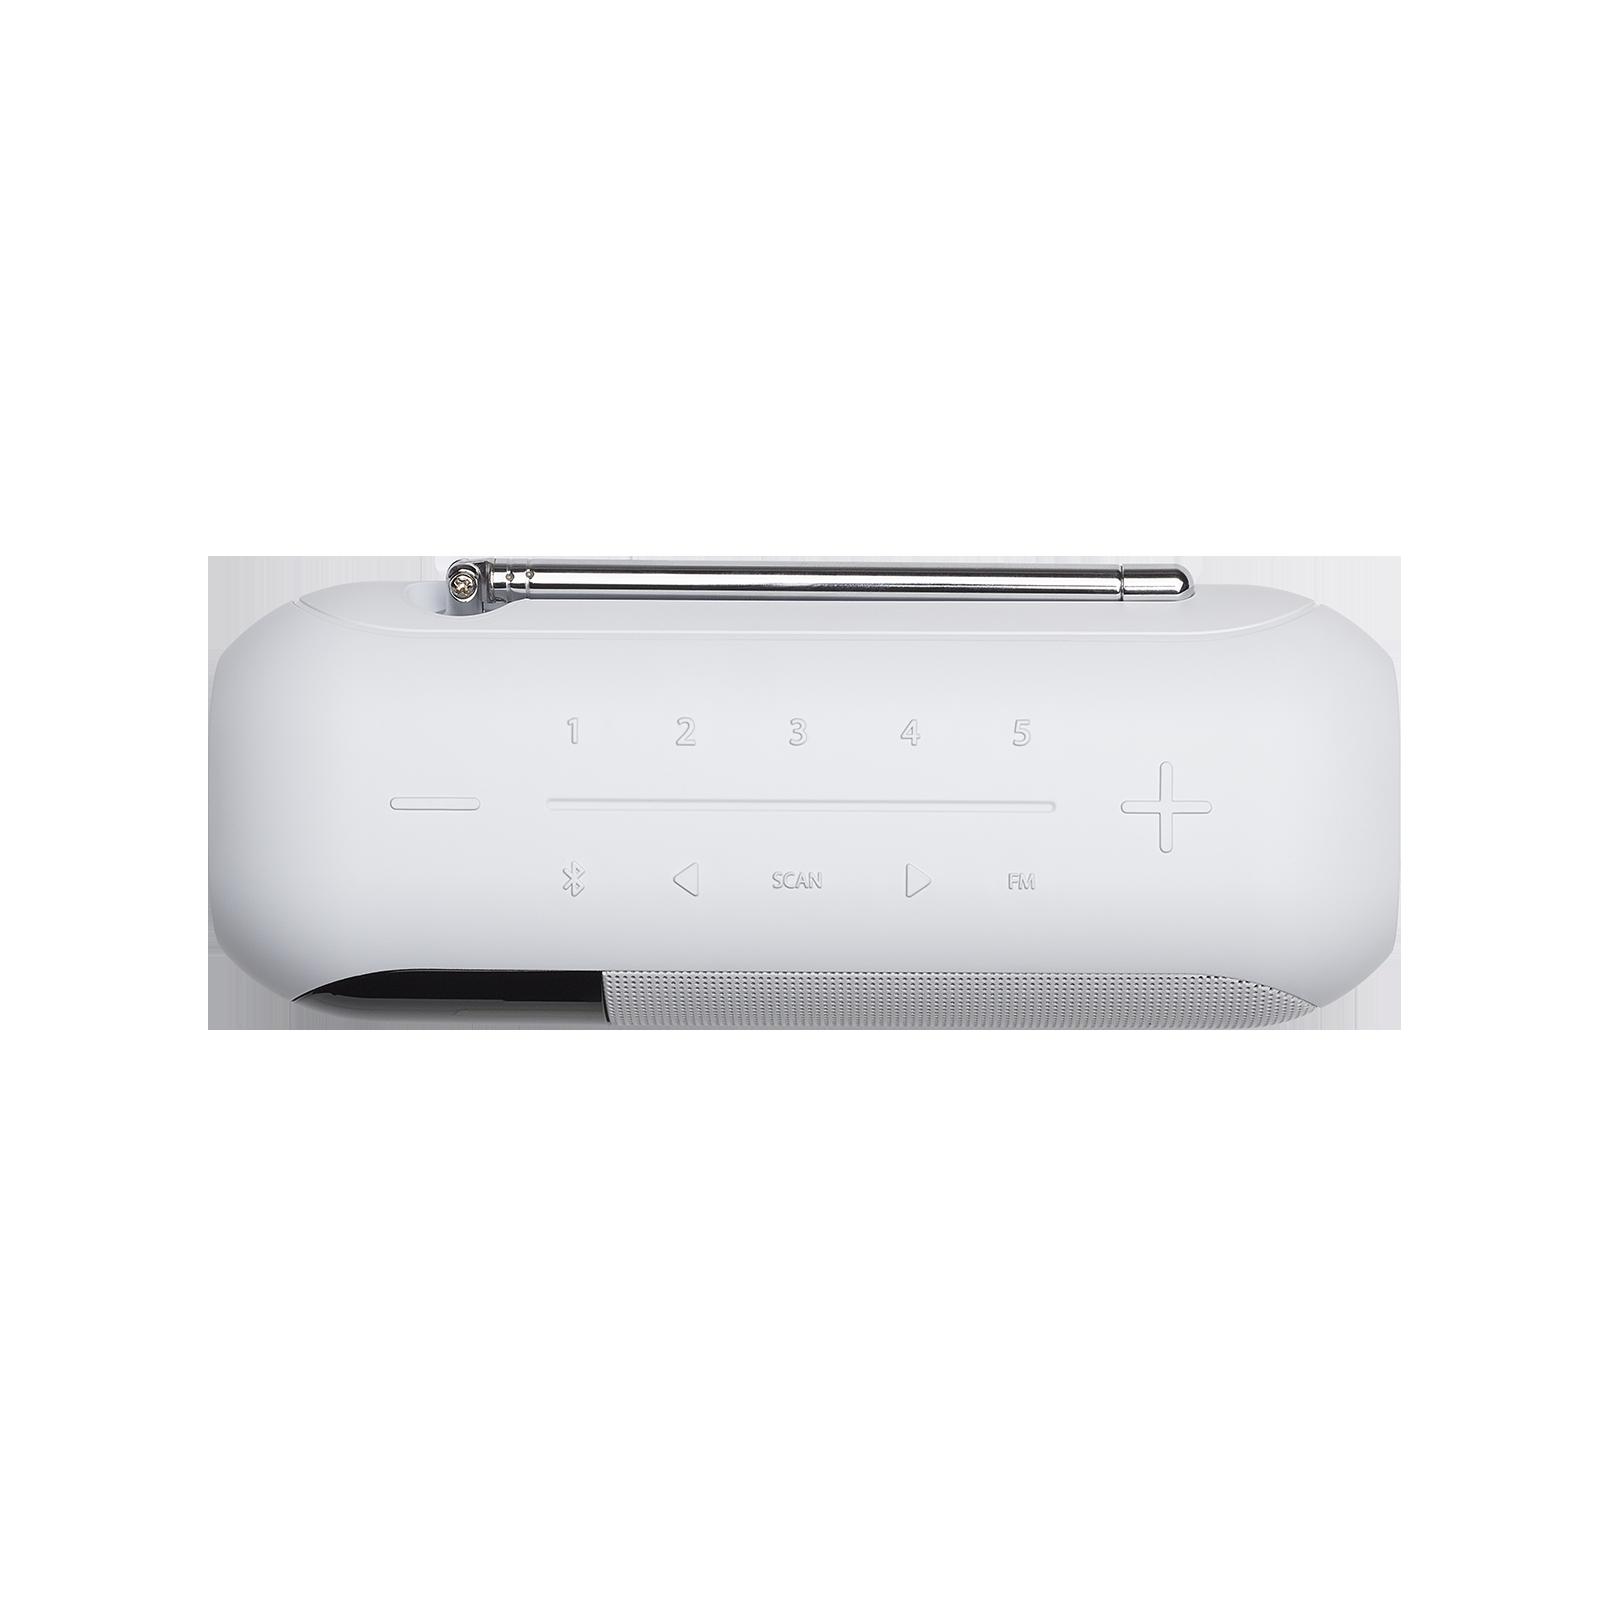 JBL Tuner 2 FM - White - Portable FM radio with Bluetooth - Detailshot 2